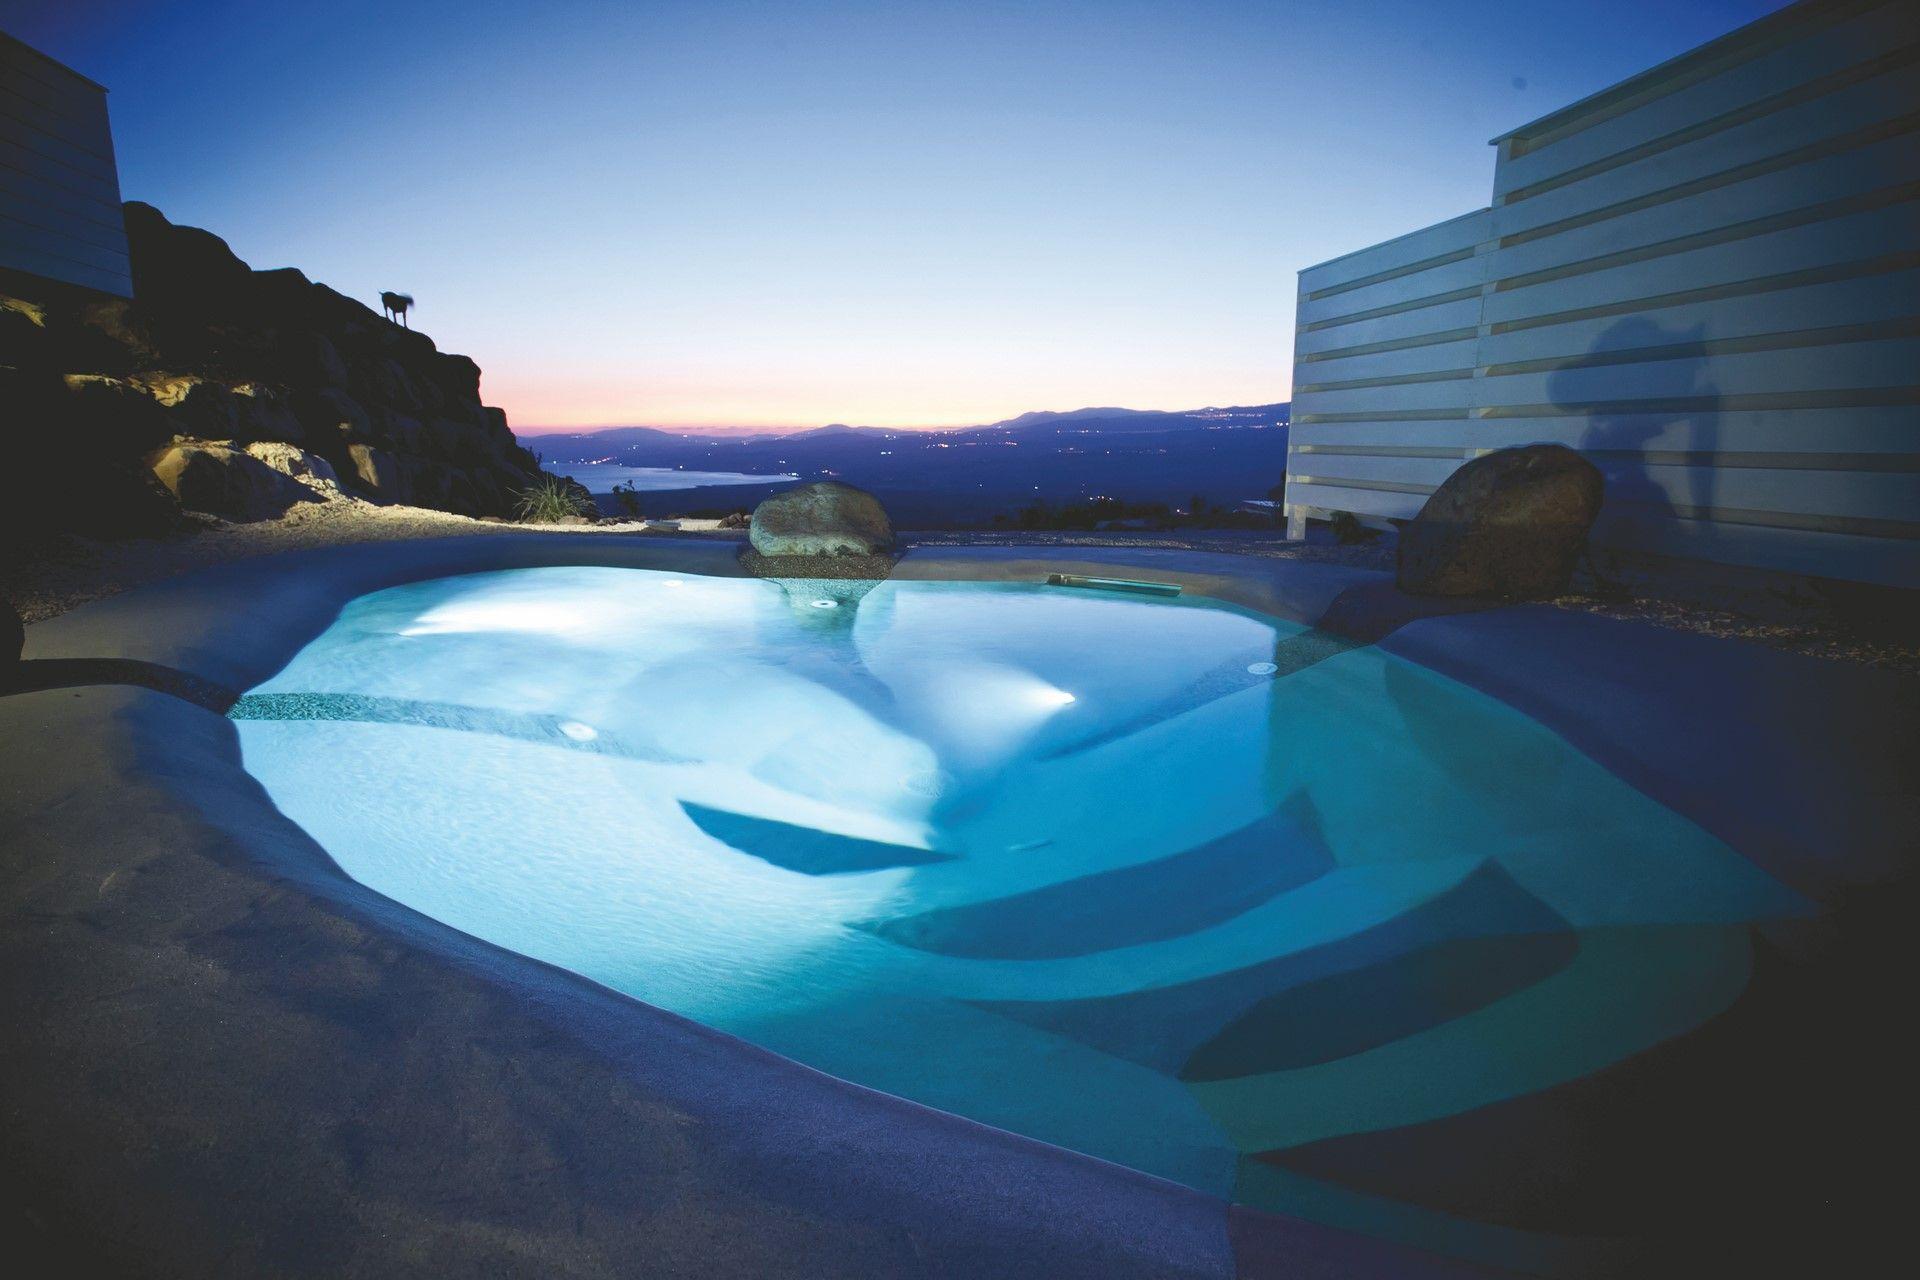 Construir piscina precio fabulous precio construir for Precio para construir una piscina